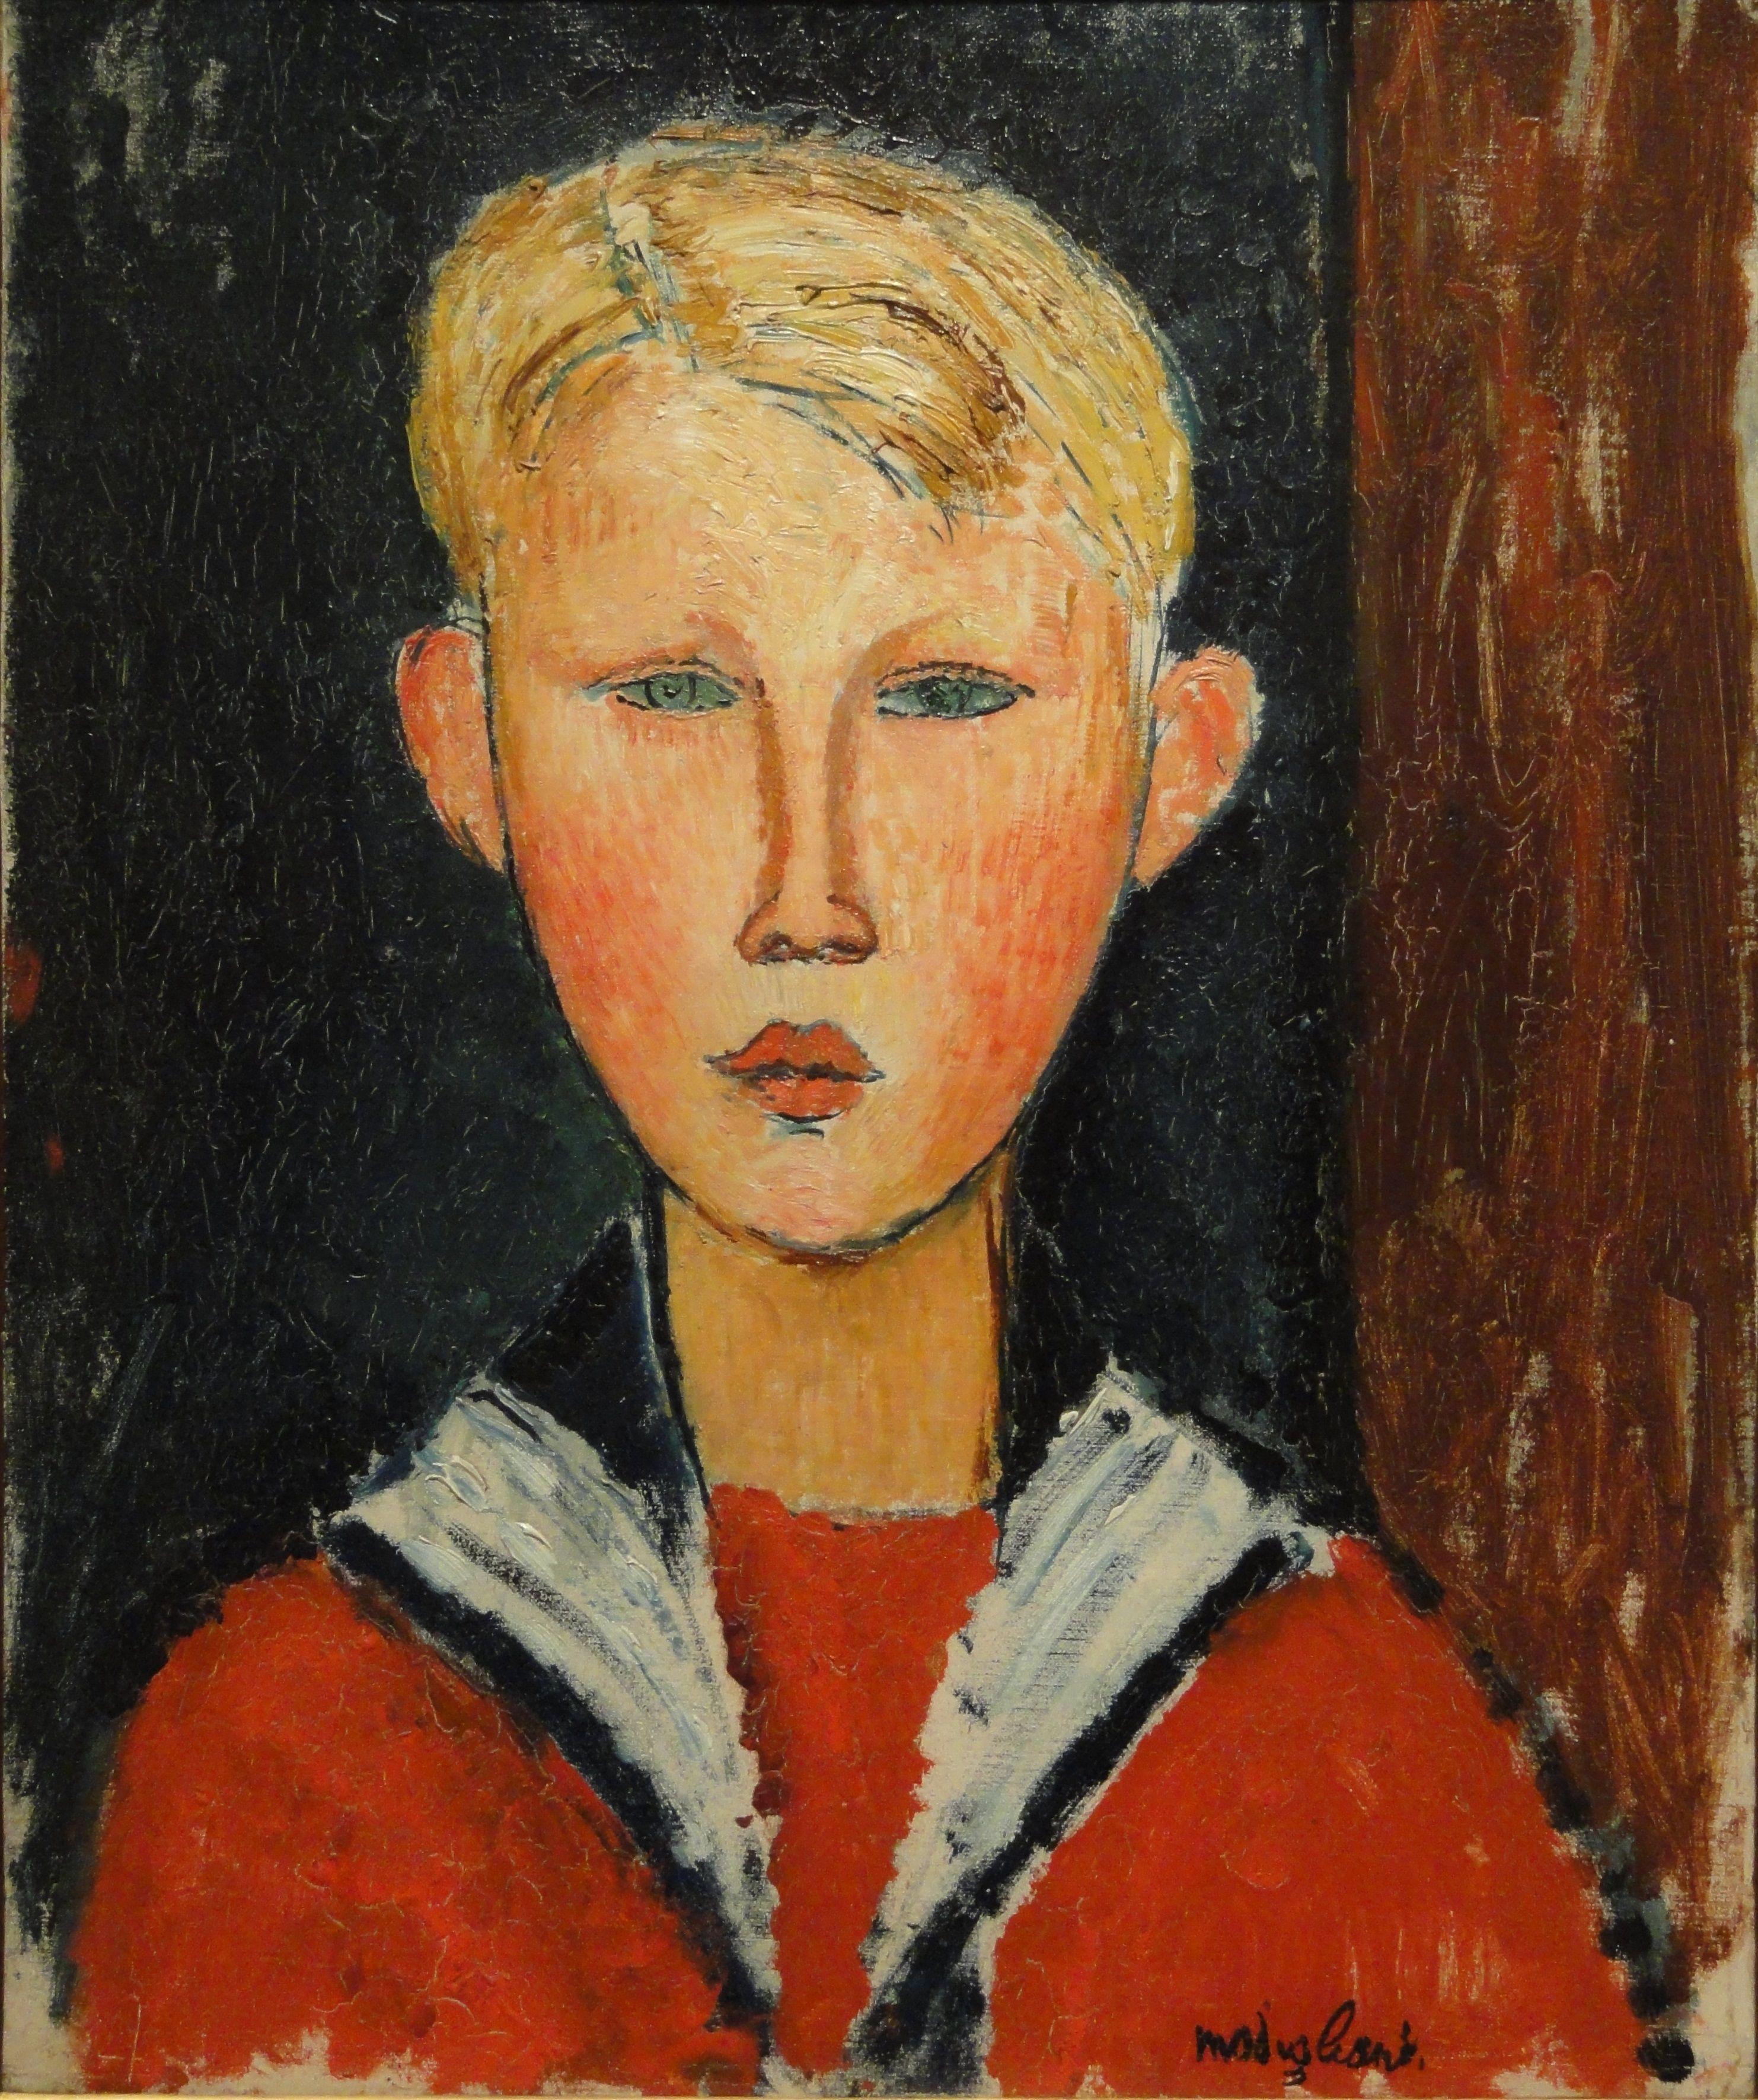 The Blue eyed Boy - Amedeo Modigliani | Художники, Амедео модильяни,  Еврейское искусство